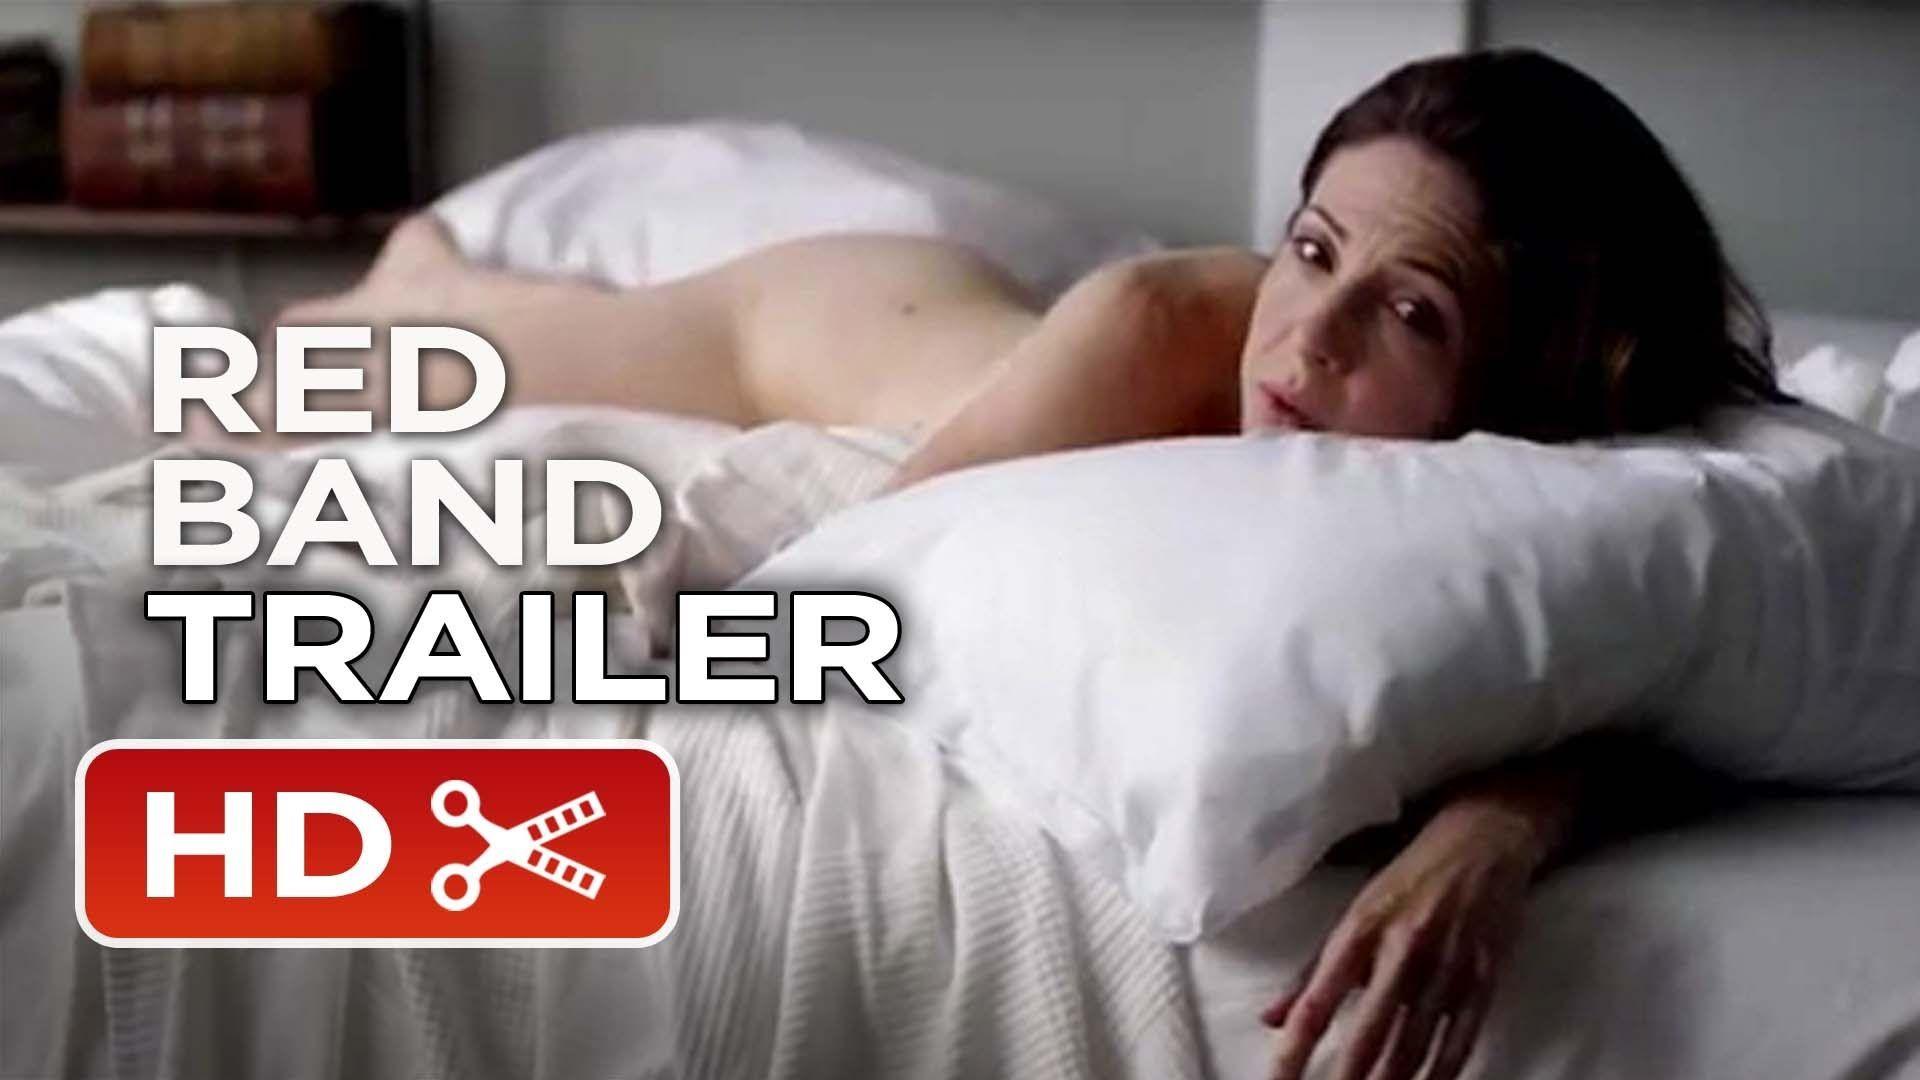 Hot Lesbian Hd Movies